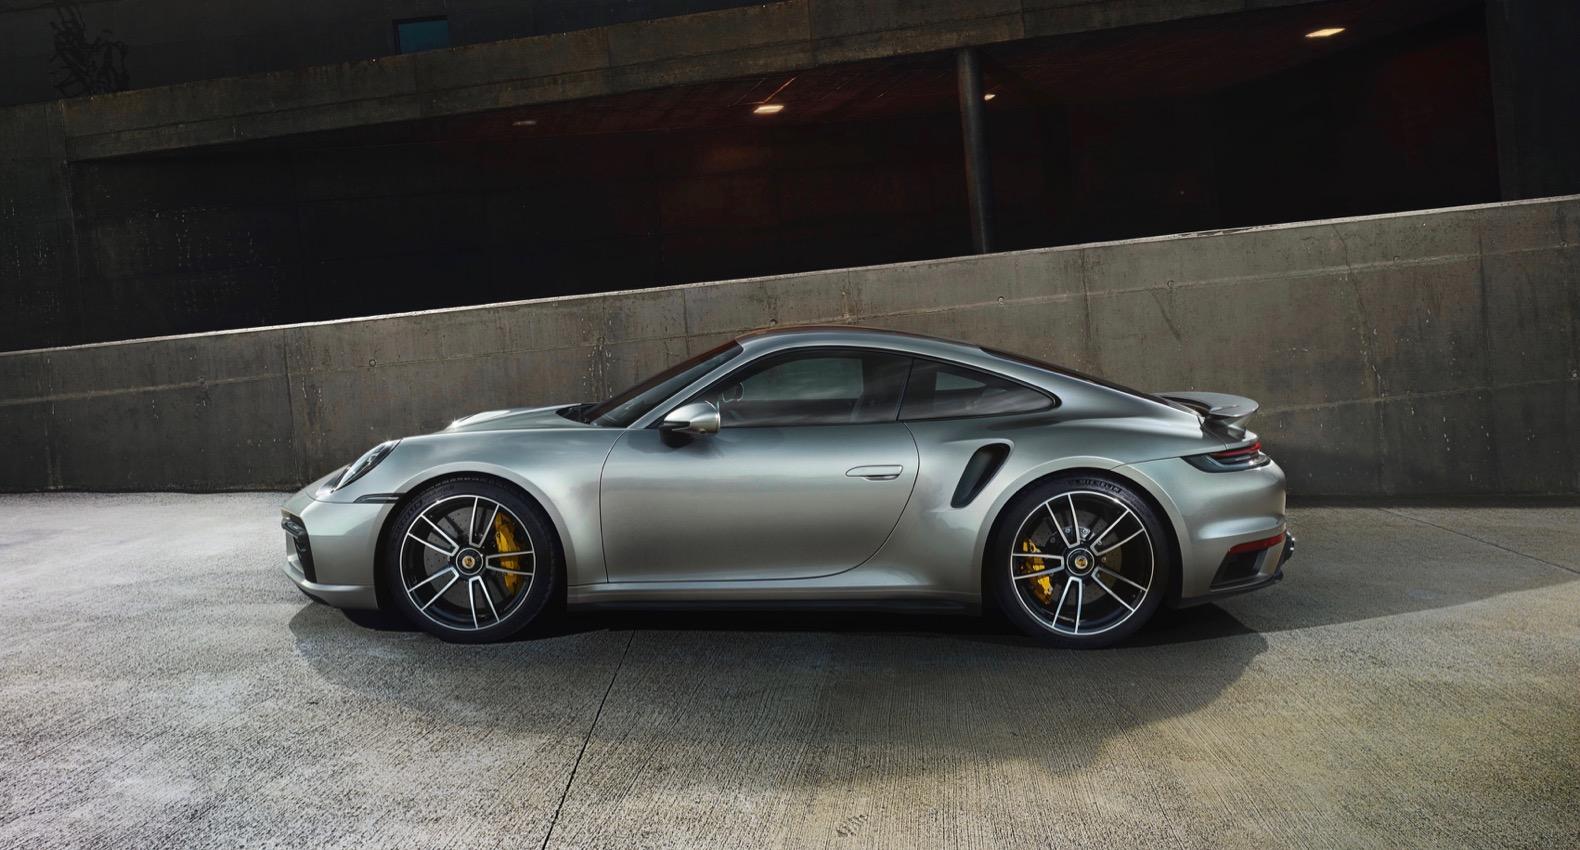 2021 Porsche 911 Turbo S Arrives With 640 Horsepower The Torque Report